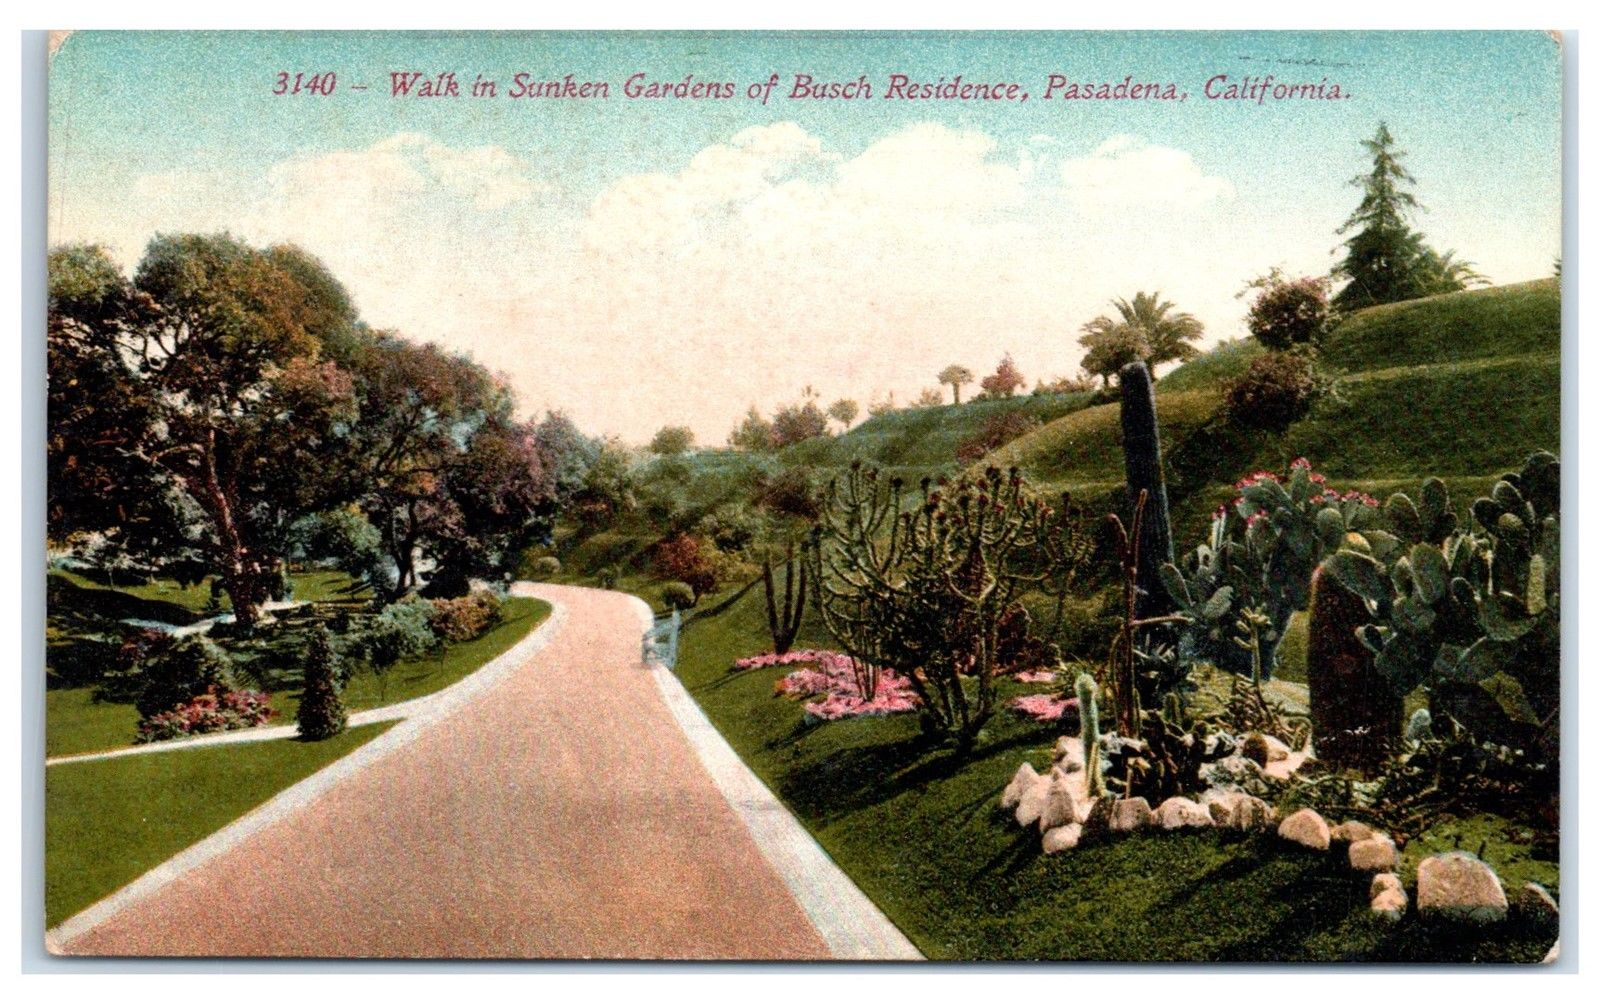 Early 1900s Sunken Gardens of Busch Residence, Pasadena, CA Postcard ...